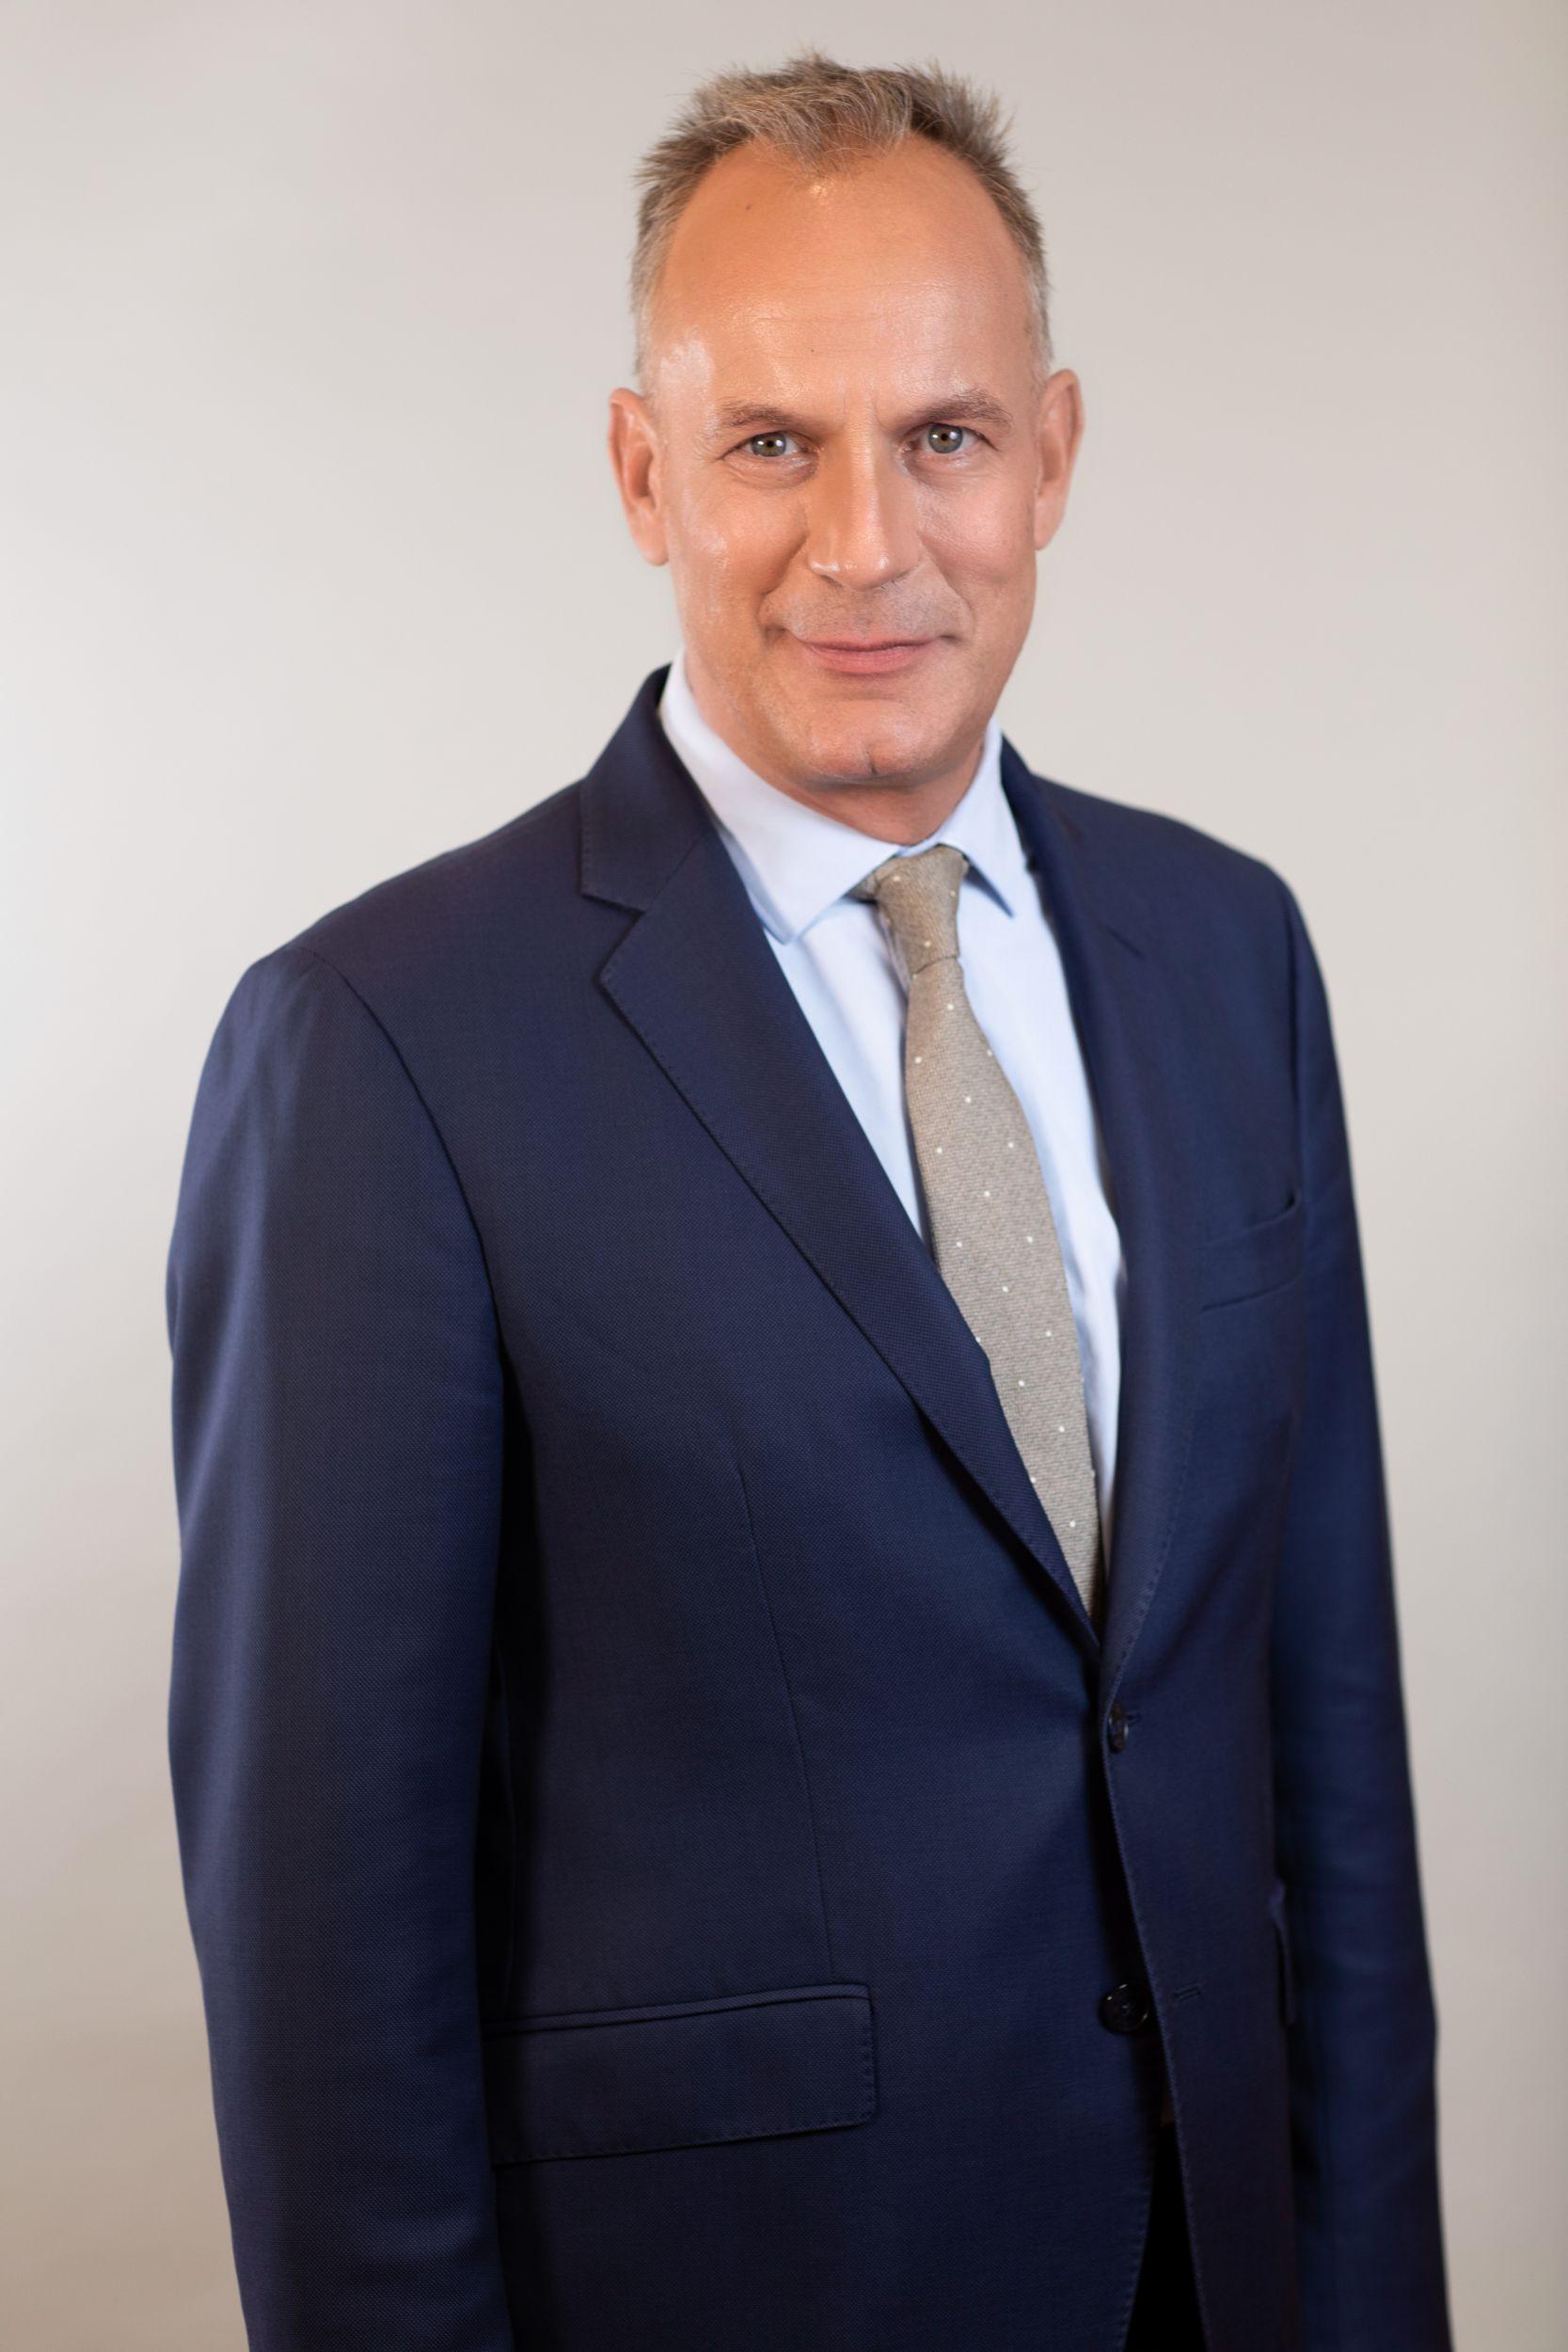 VDMA legt 'Wunschkapitel' für Koalitionsvertrag vor